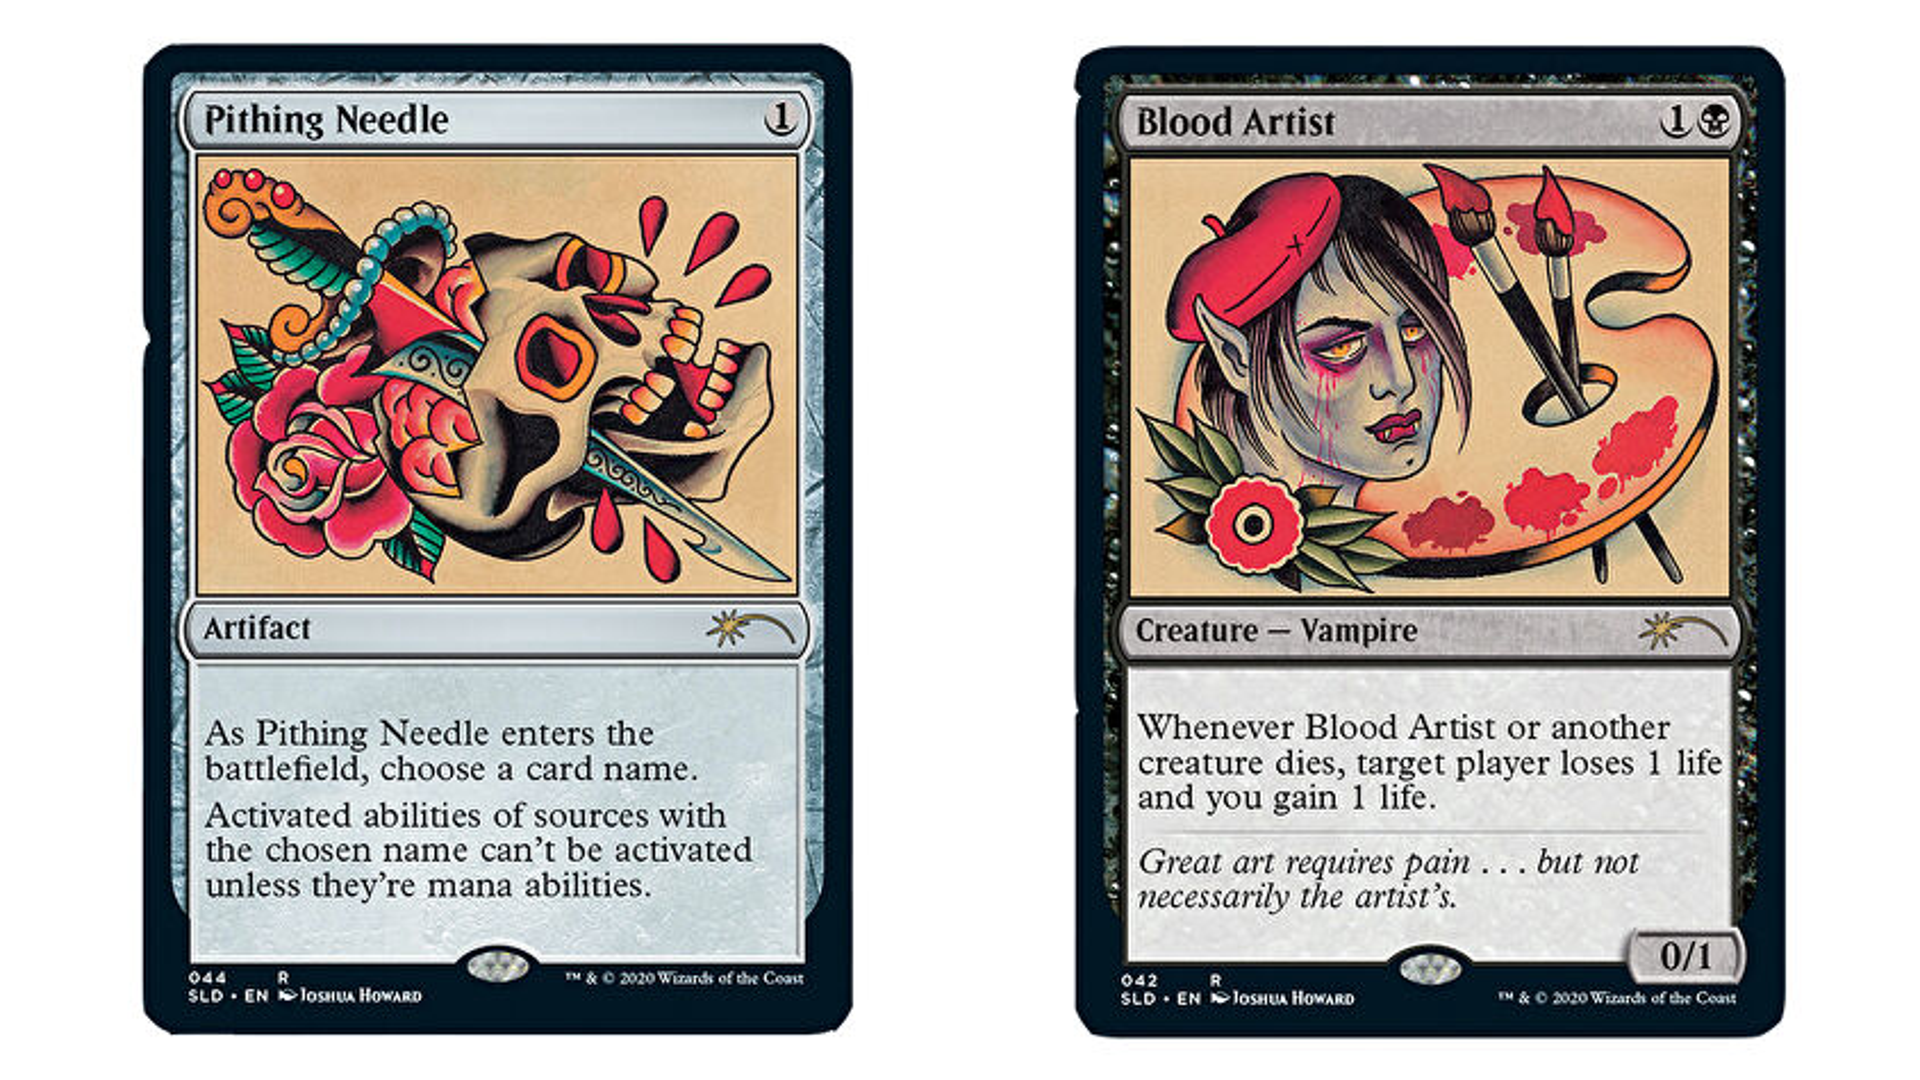 magic-the-gathering-secret-lair-summer-superdrop-tattoo-cards.jpg